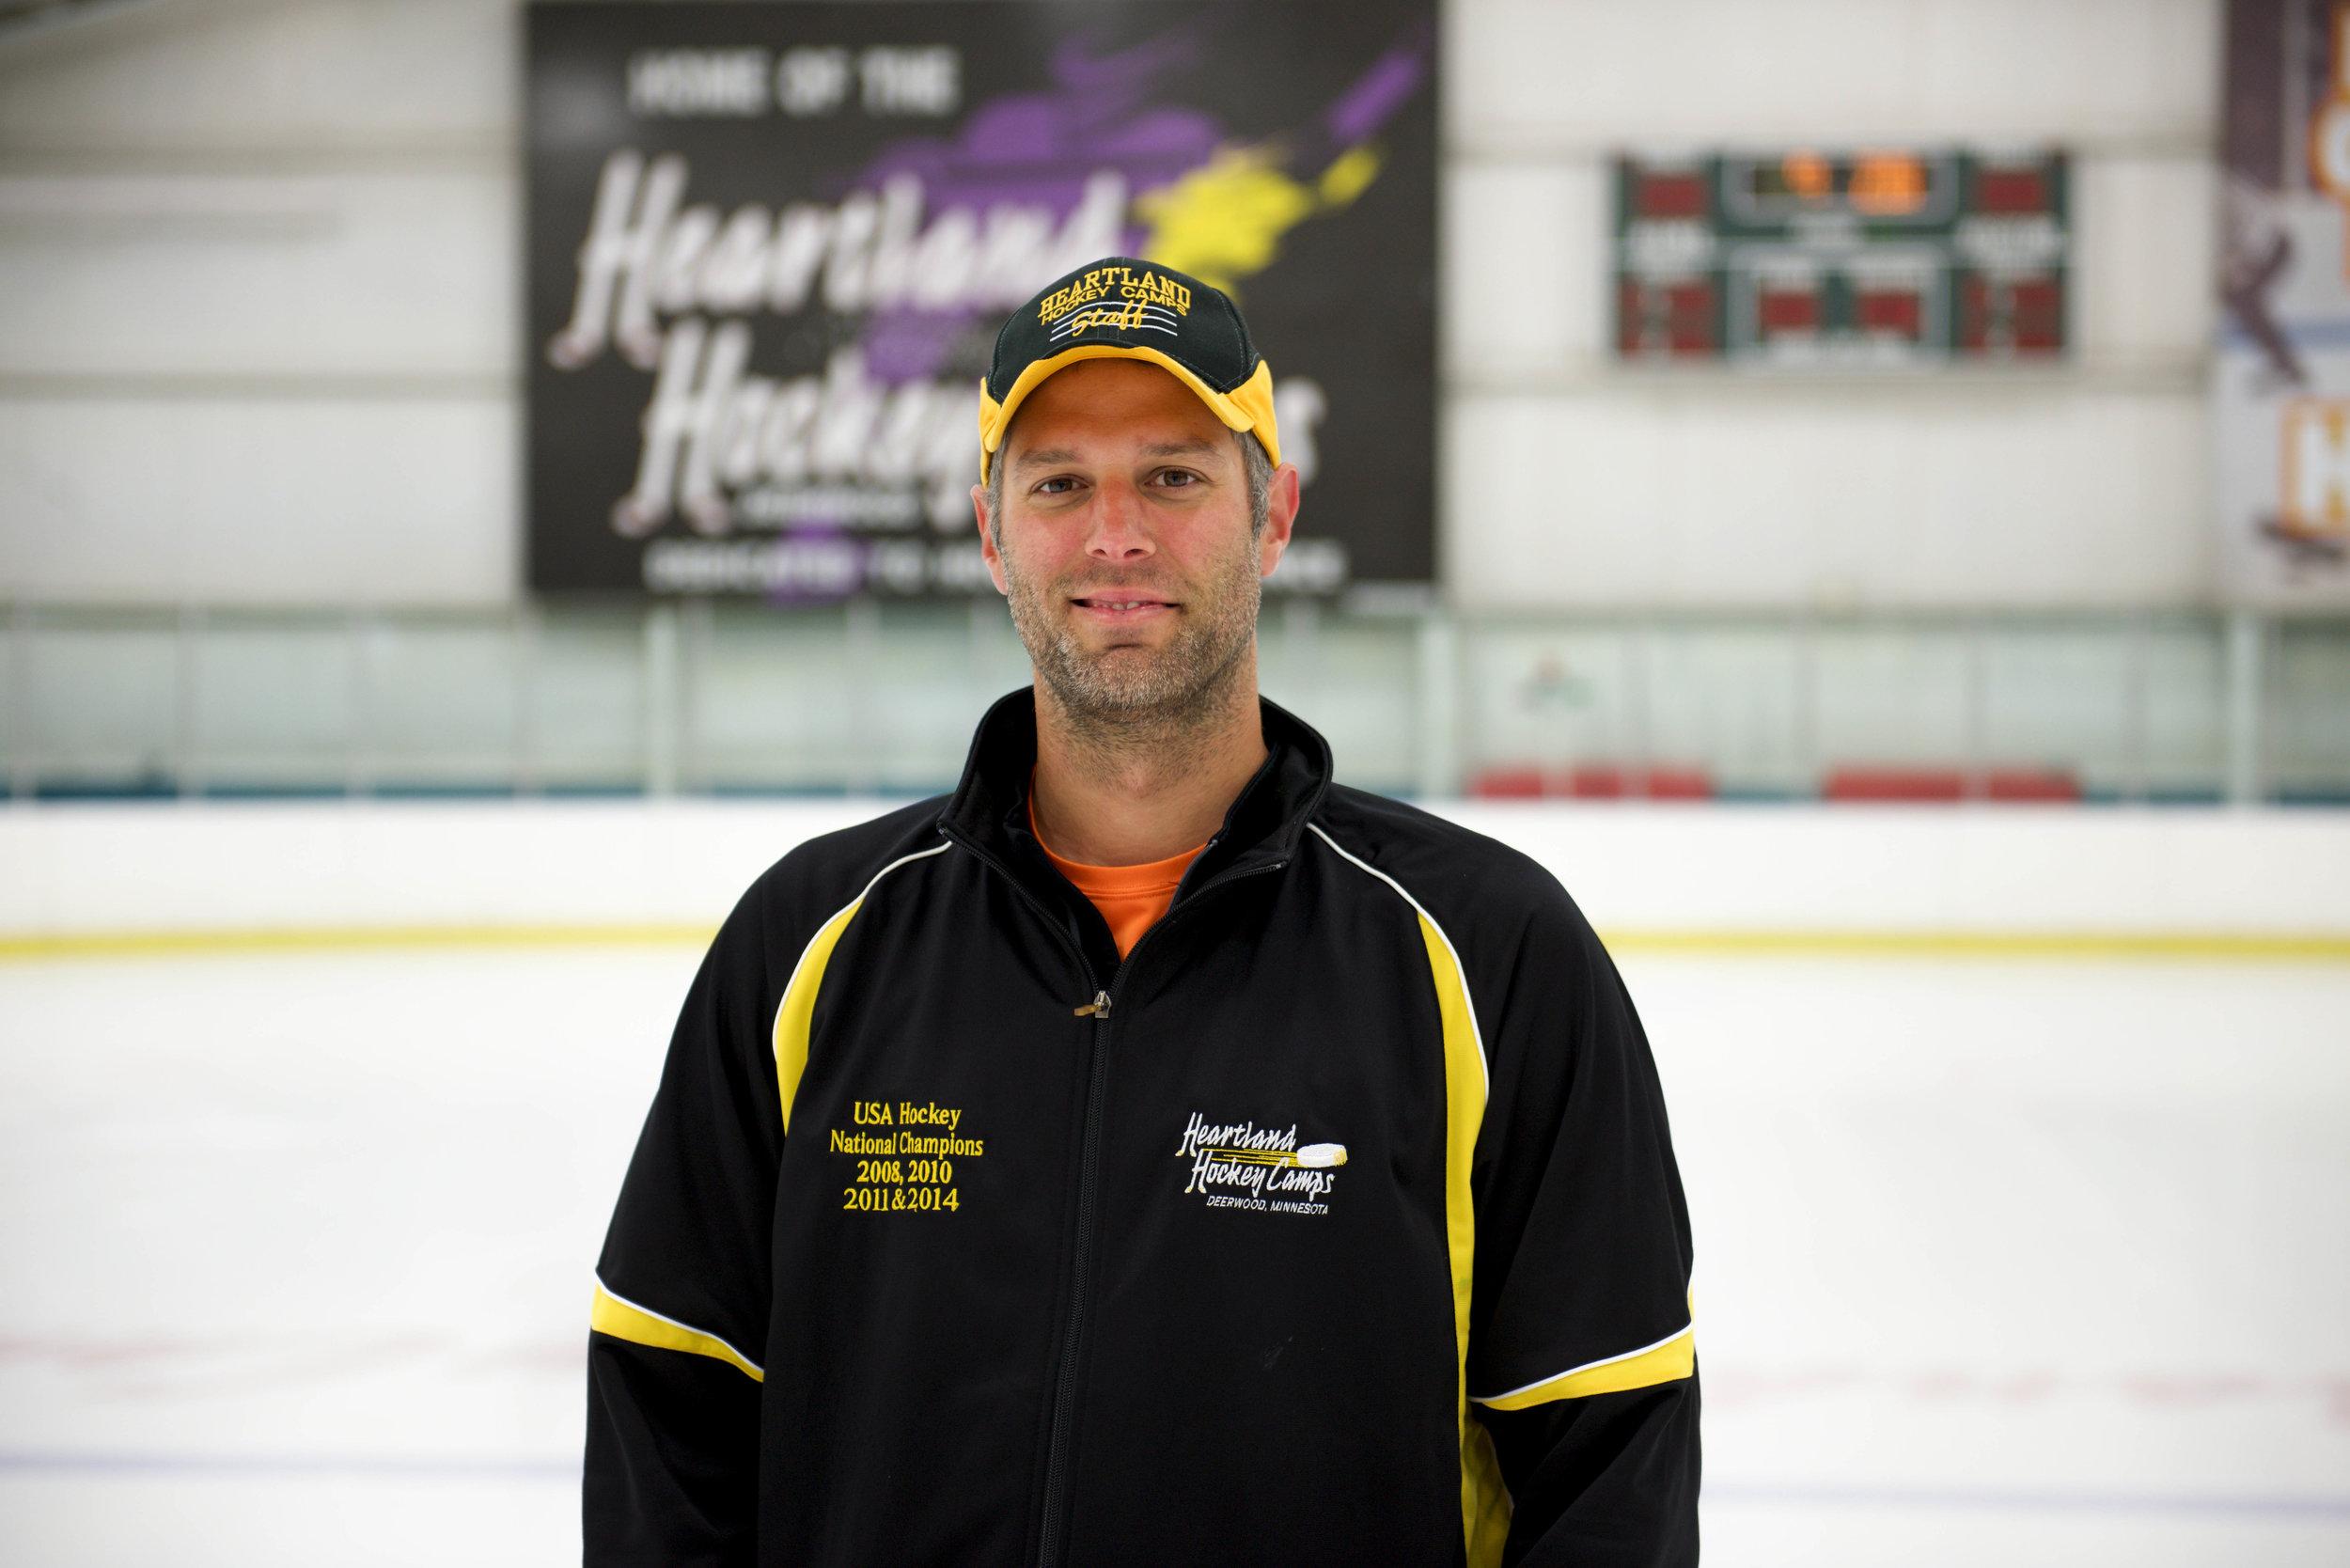 Sean Rekeny Head Coach/General Manager